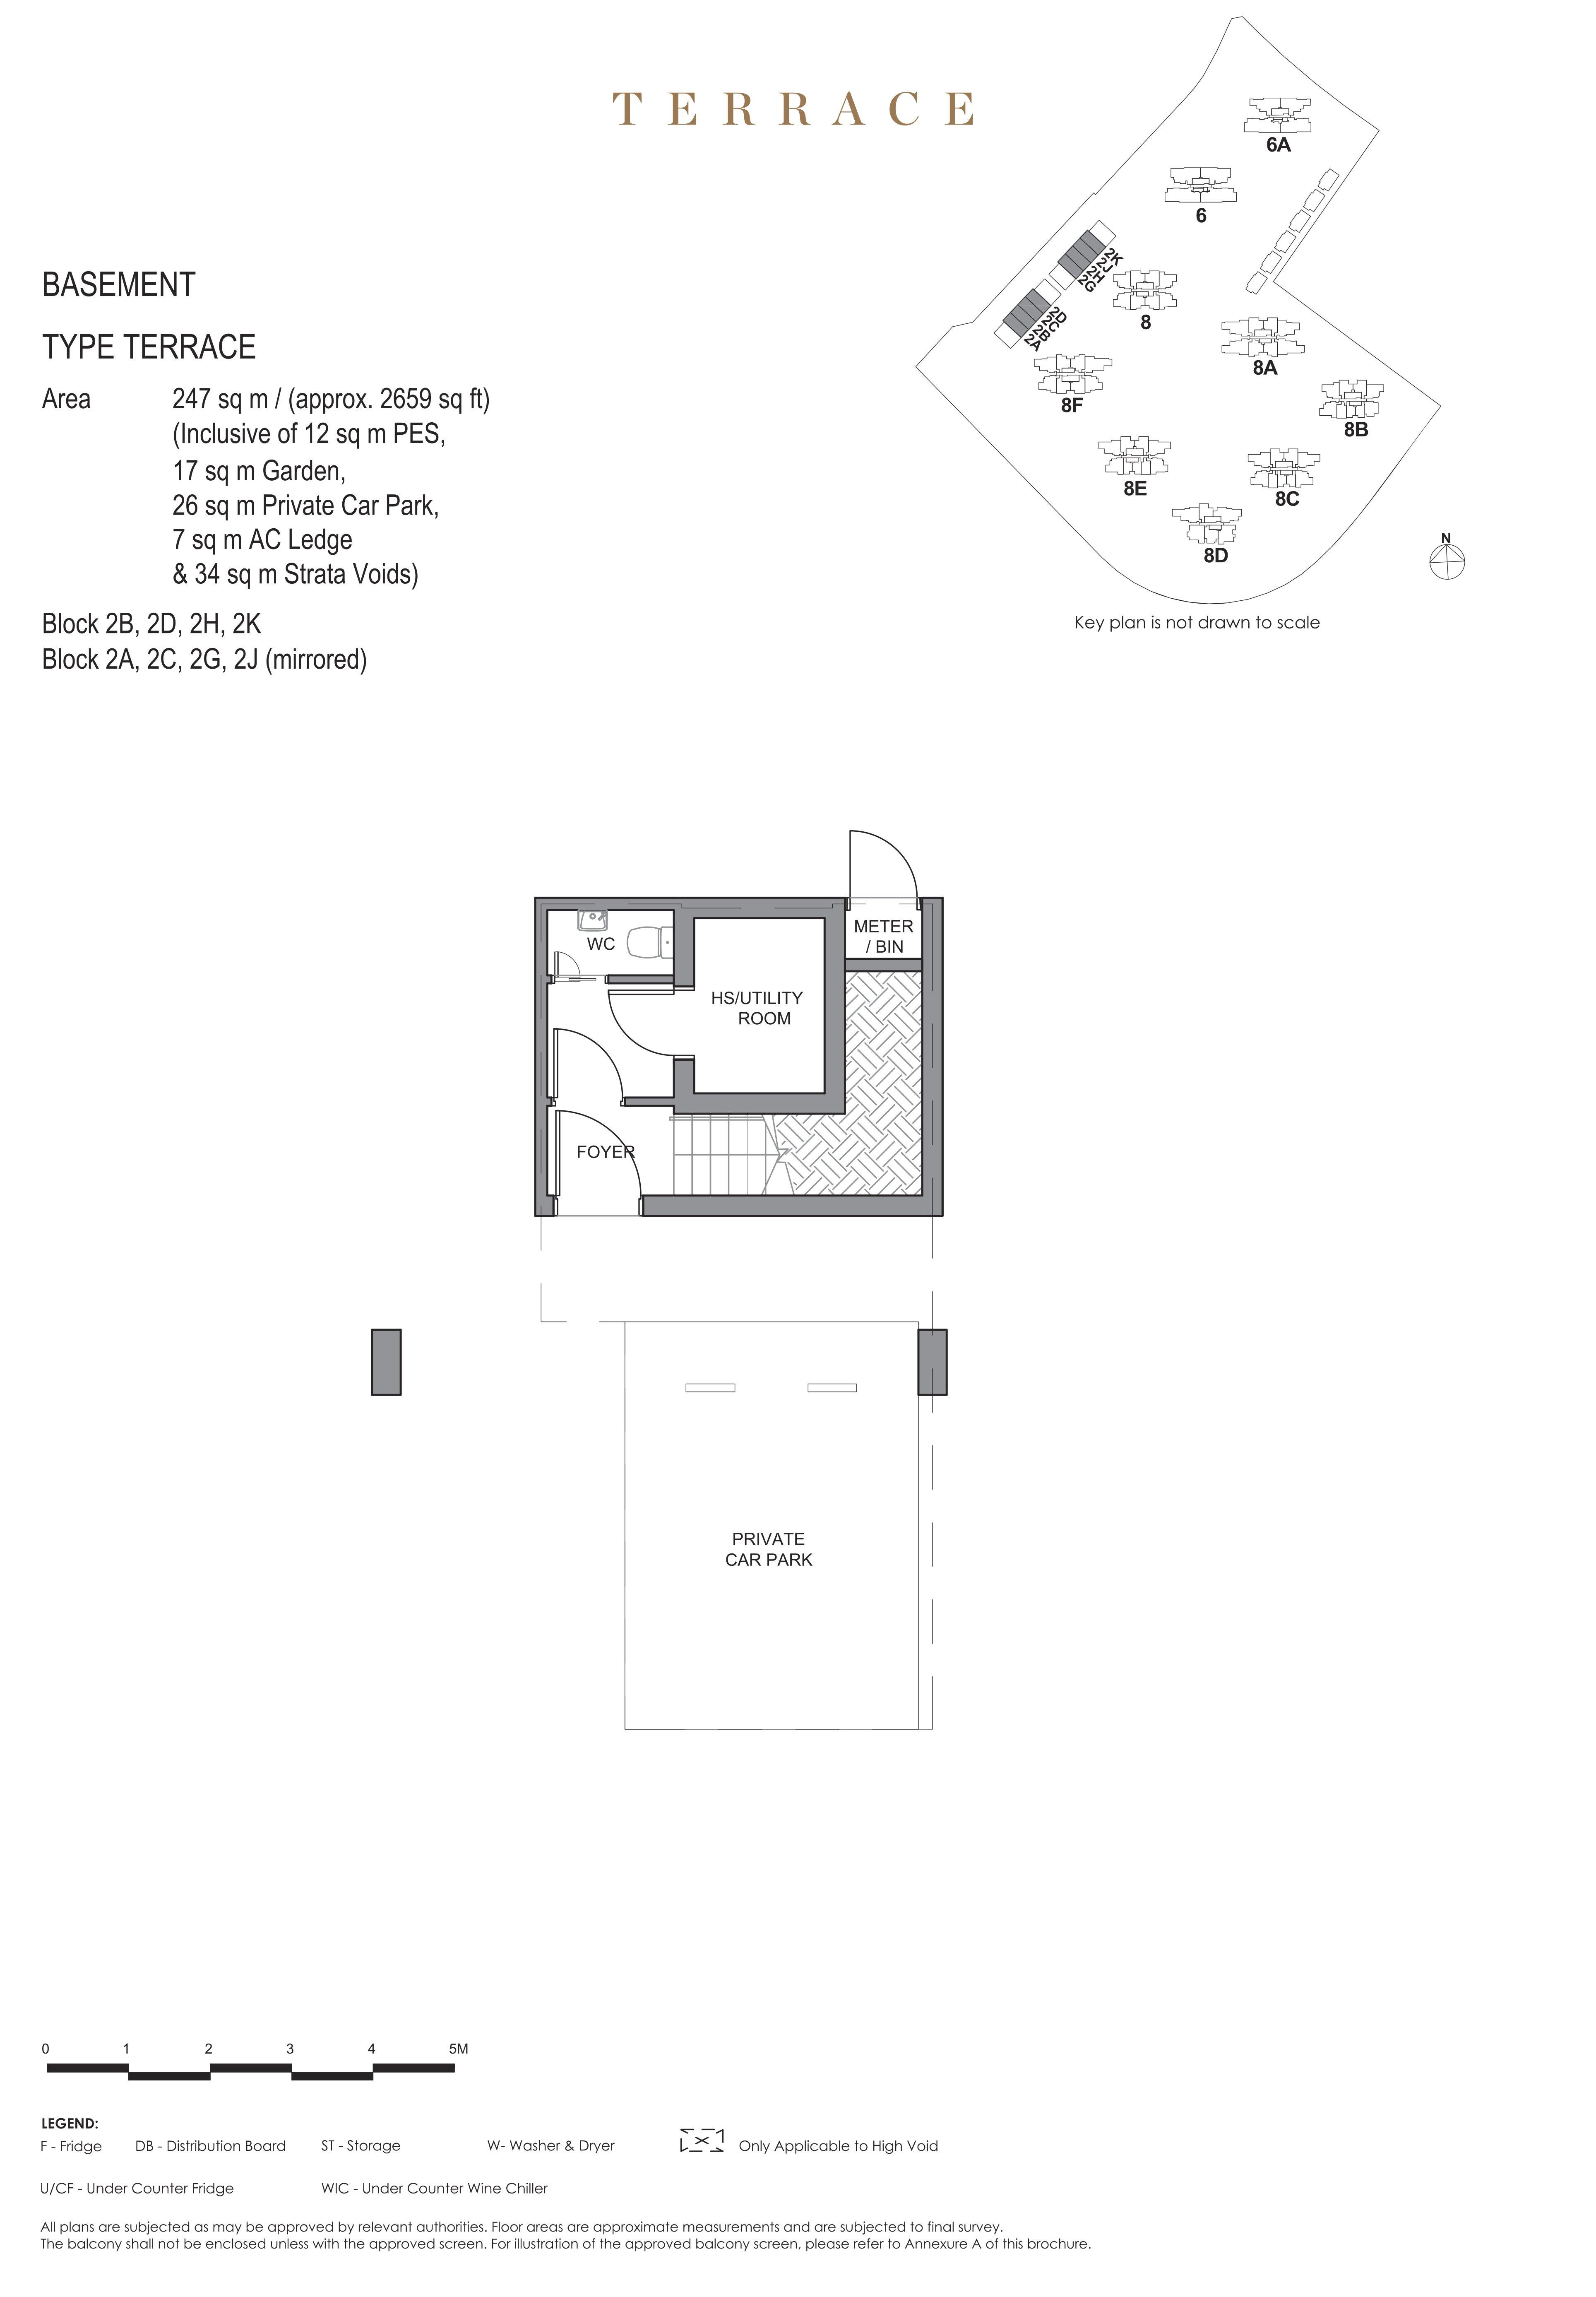 Parc Clematis 锦泰门第 masterpiece Intermediate Terrace basement